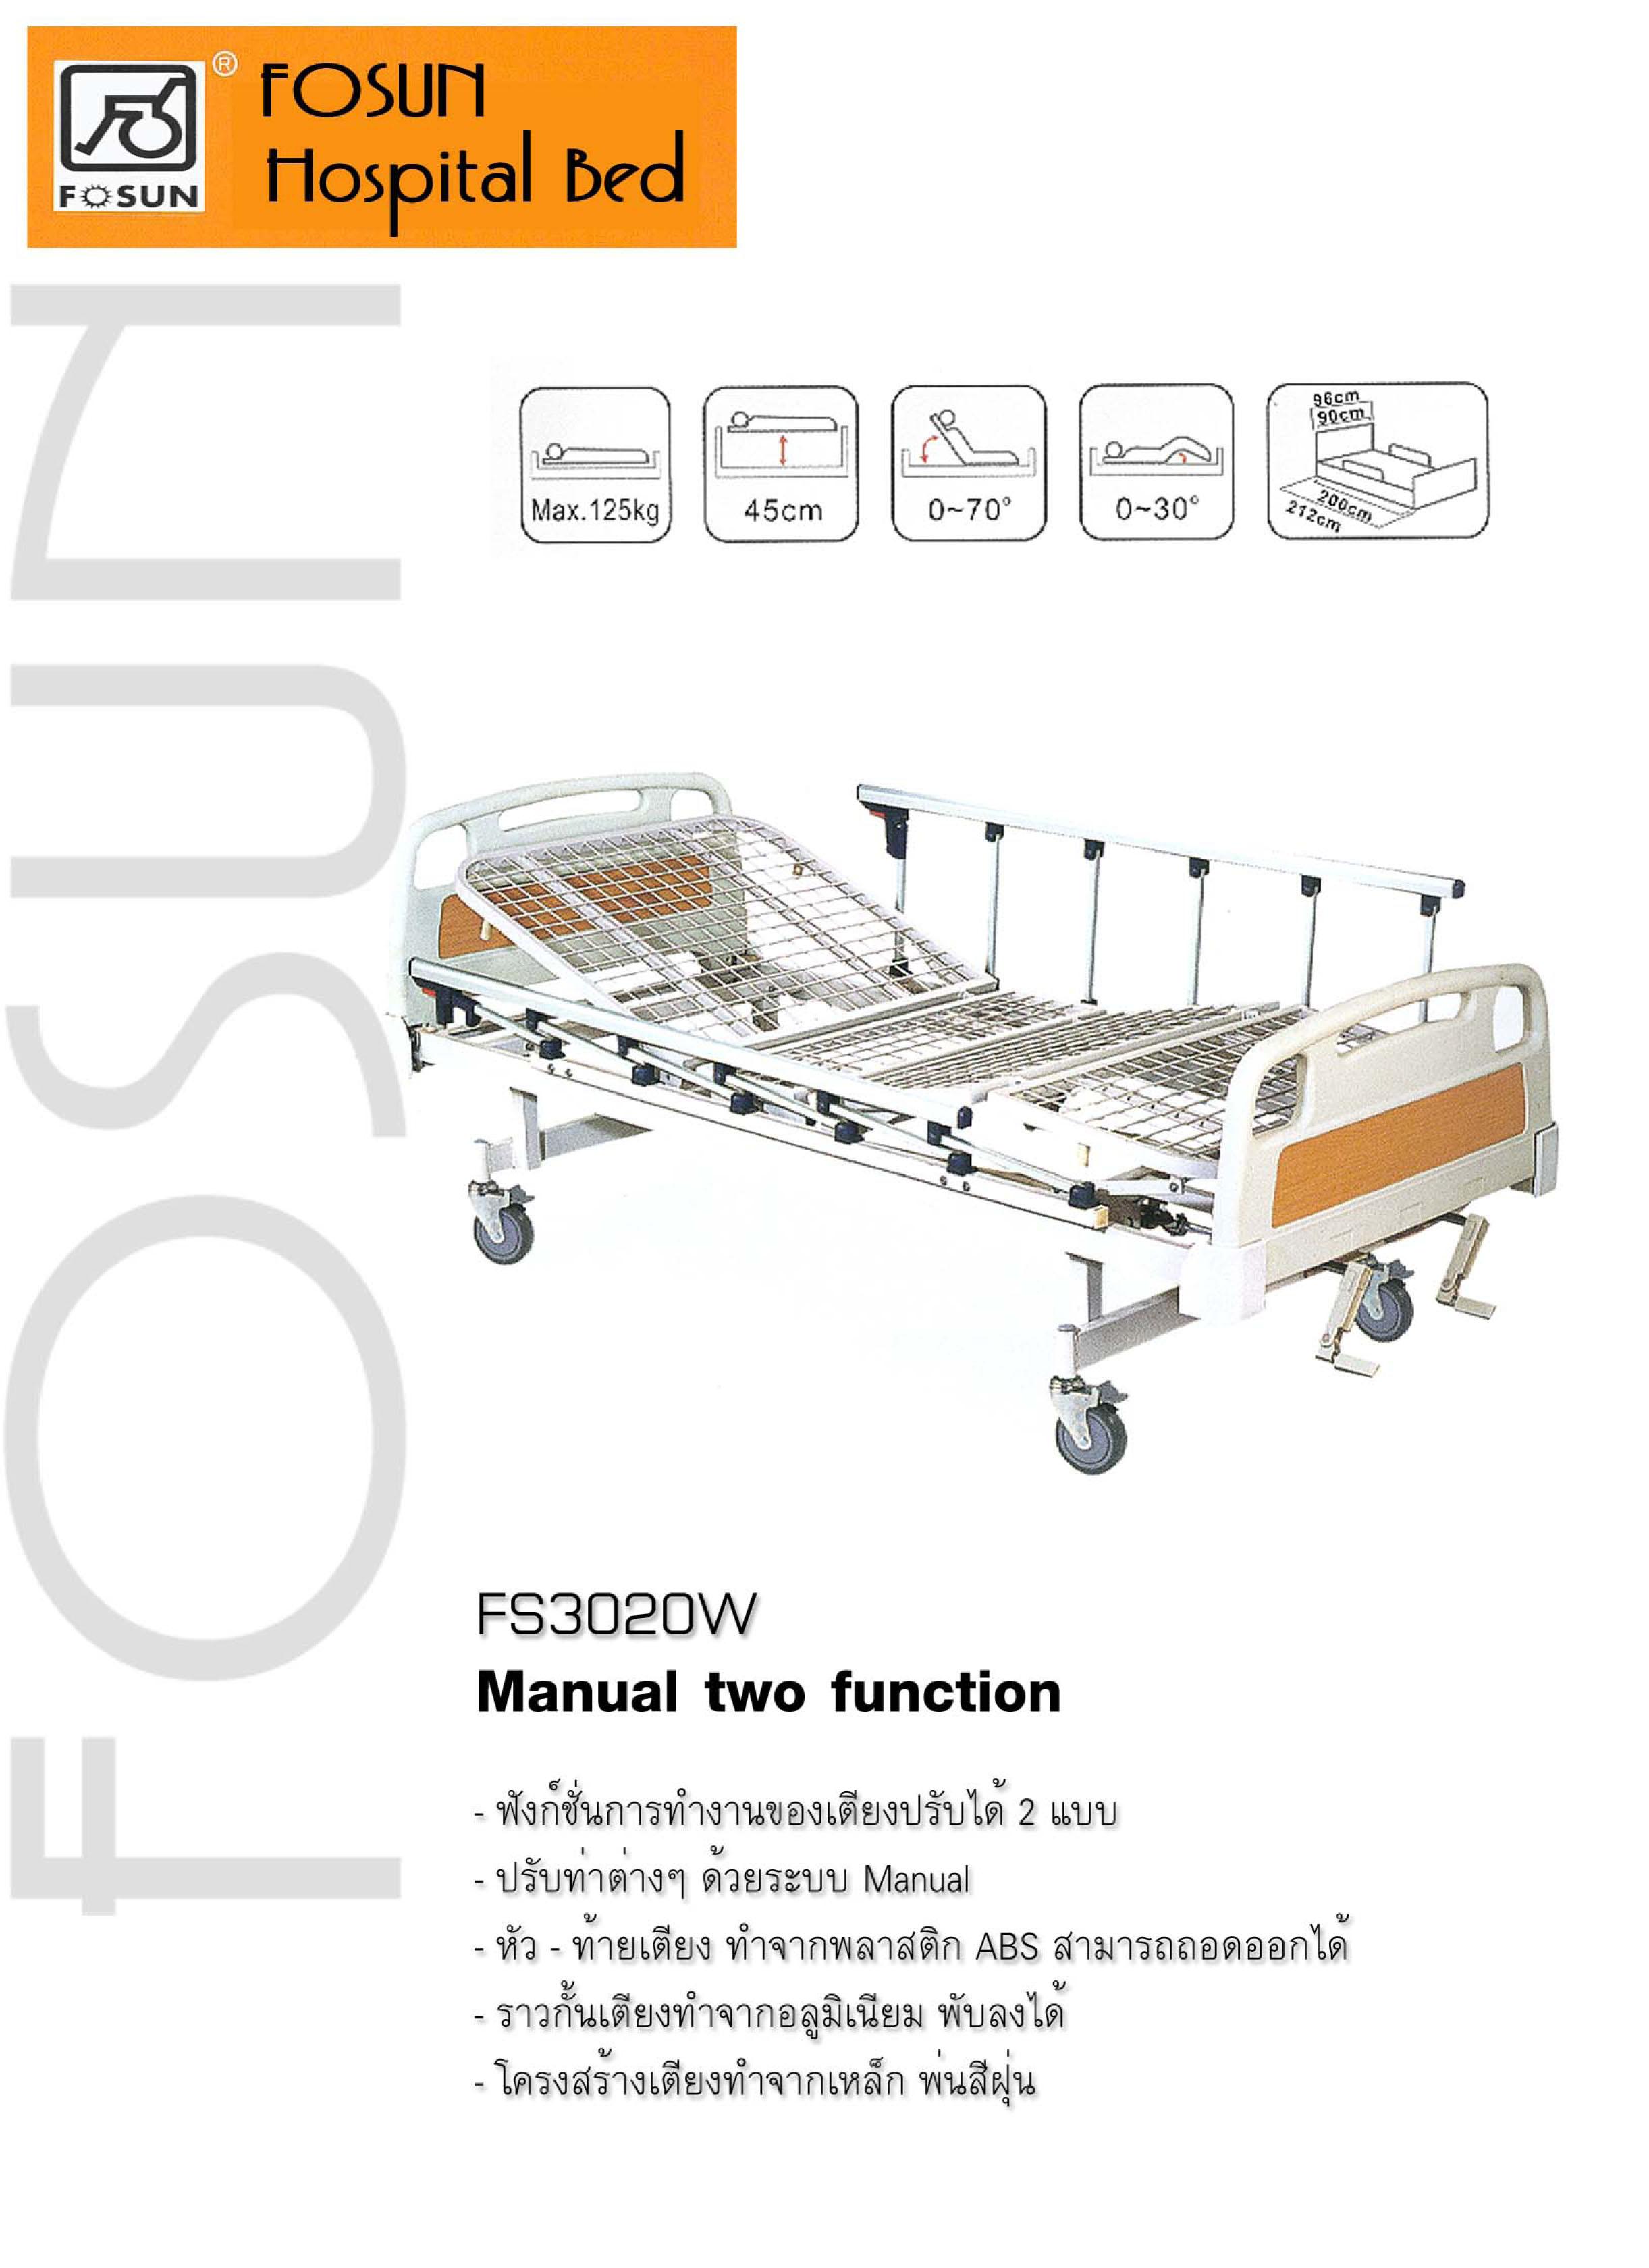 FOSUN-3020W-Hospital-Bed